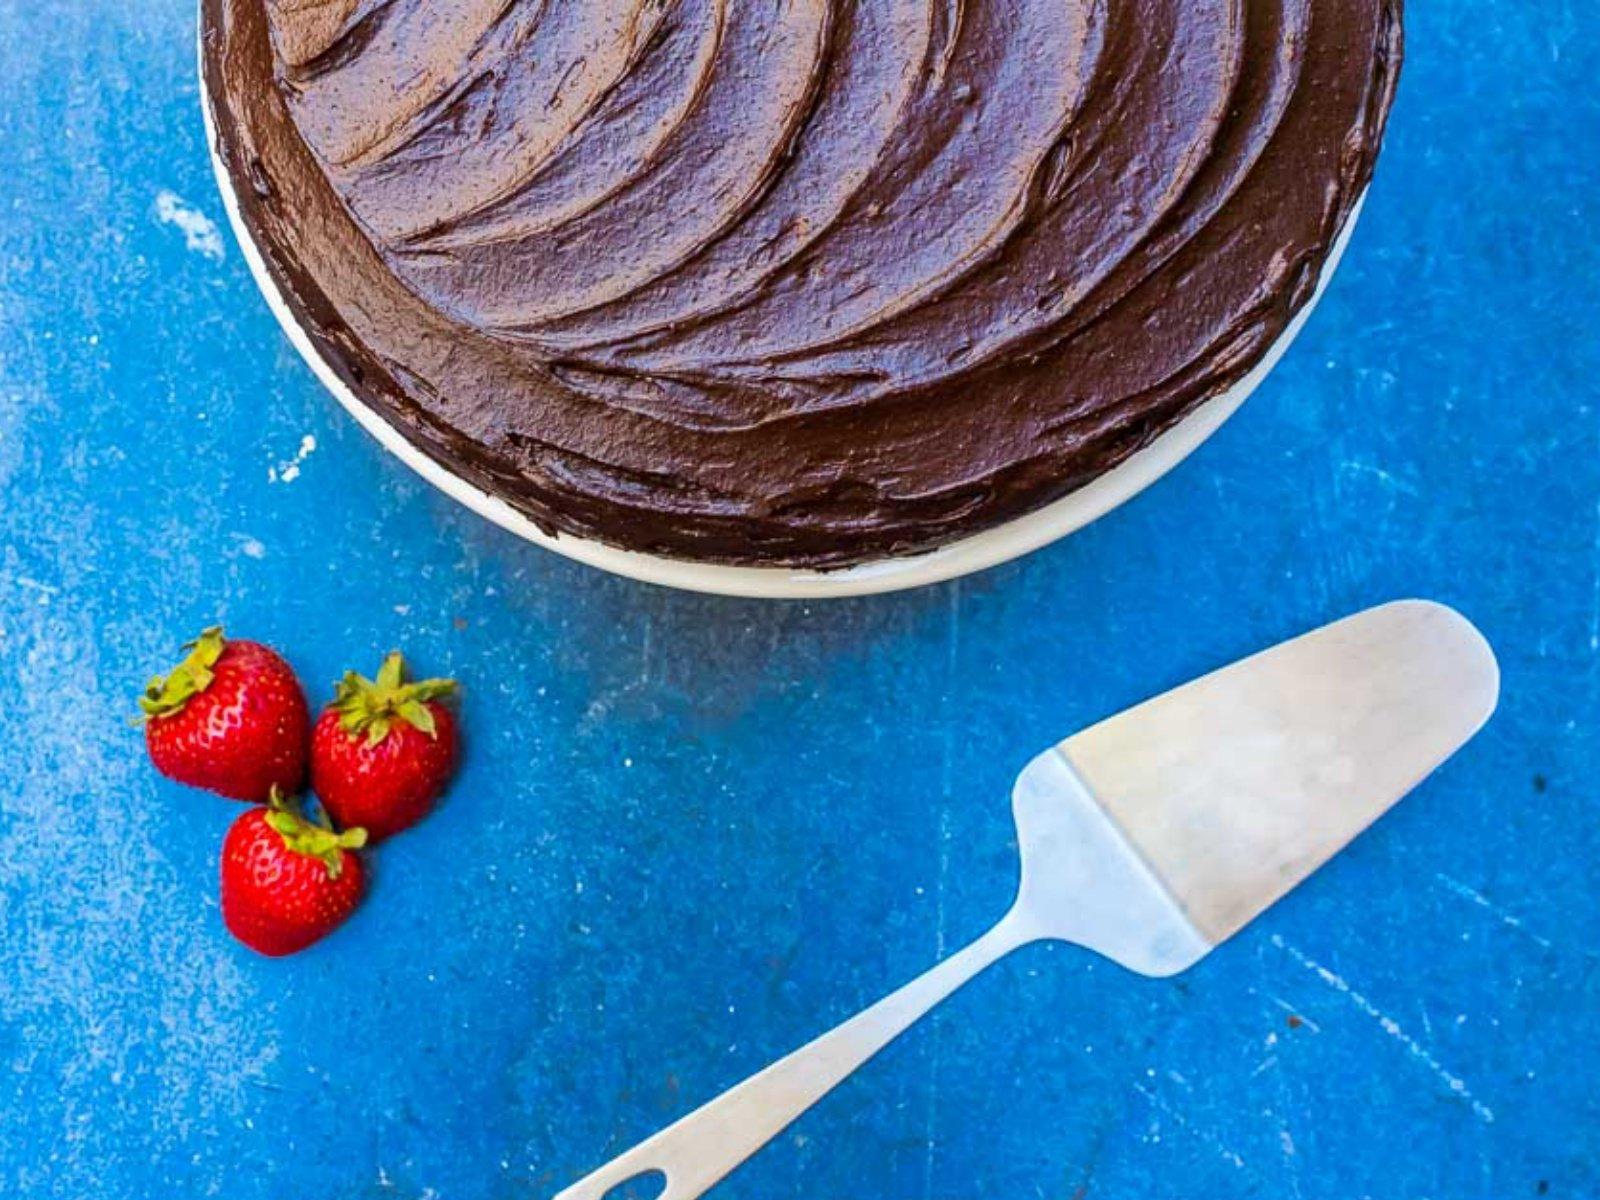 vegan chocolate cake with creamy chocolate frosting